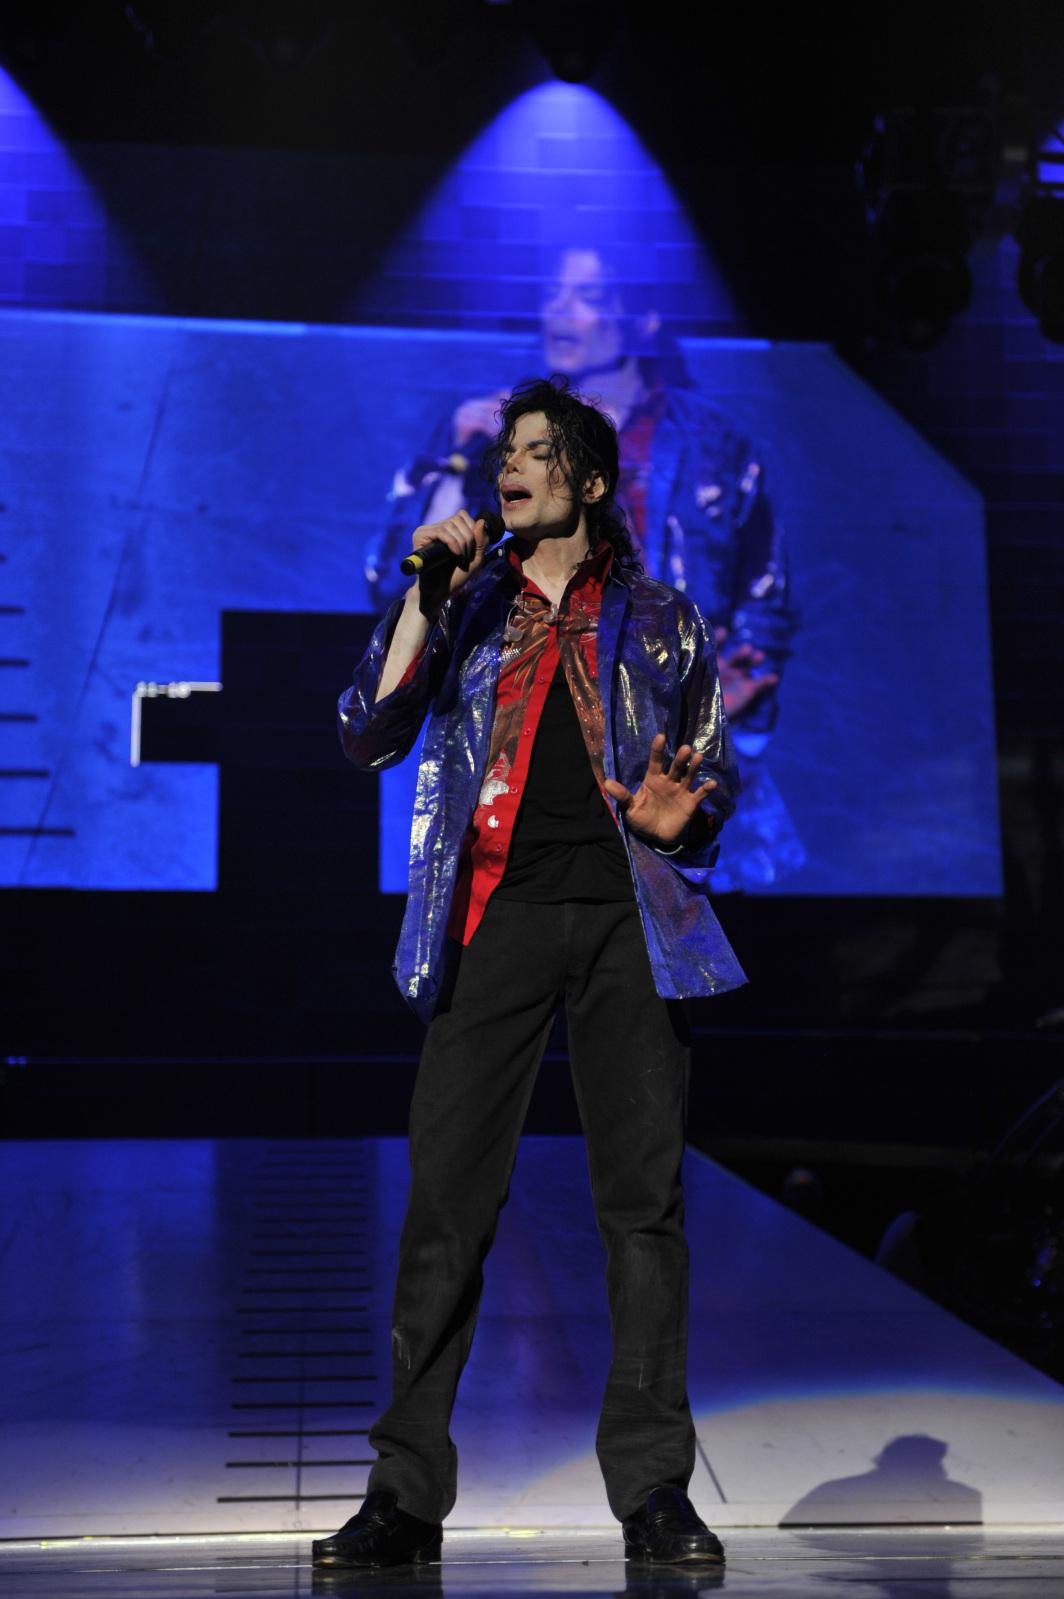 http://4.bp.blogspot.com/__iuYbs5zGVw/TRbU_dfffyI/AAAAAAAAAR0/Luq12U4eCp4/s1600/michael-jackson-this-is-it-blue-solo.jpg